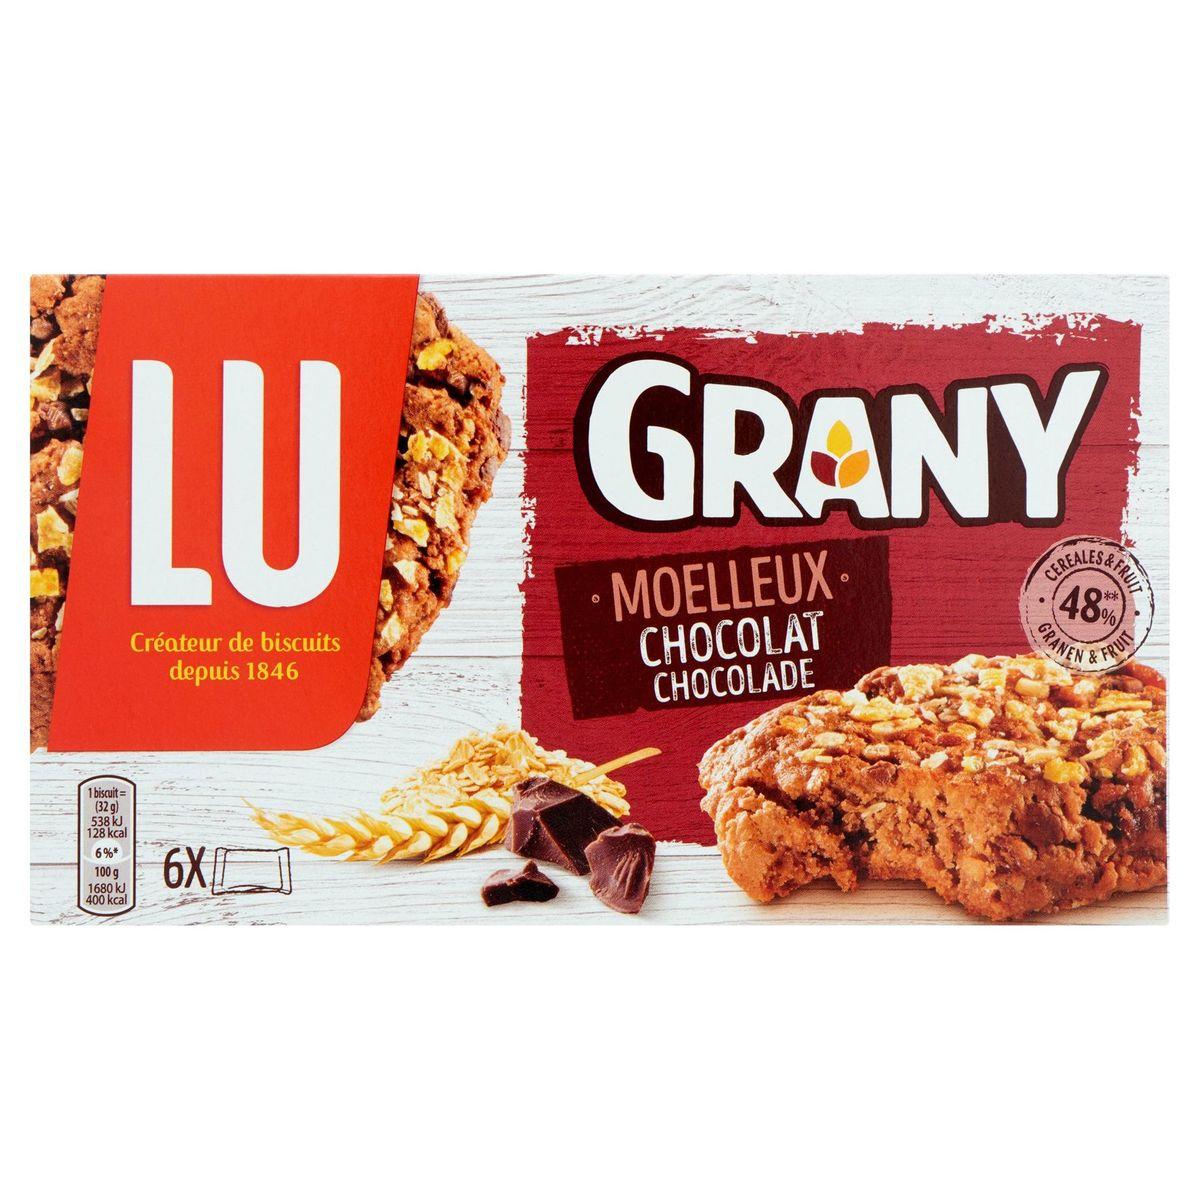 Lu Grany Moelleux Chocolat 192 g